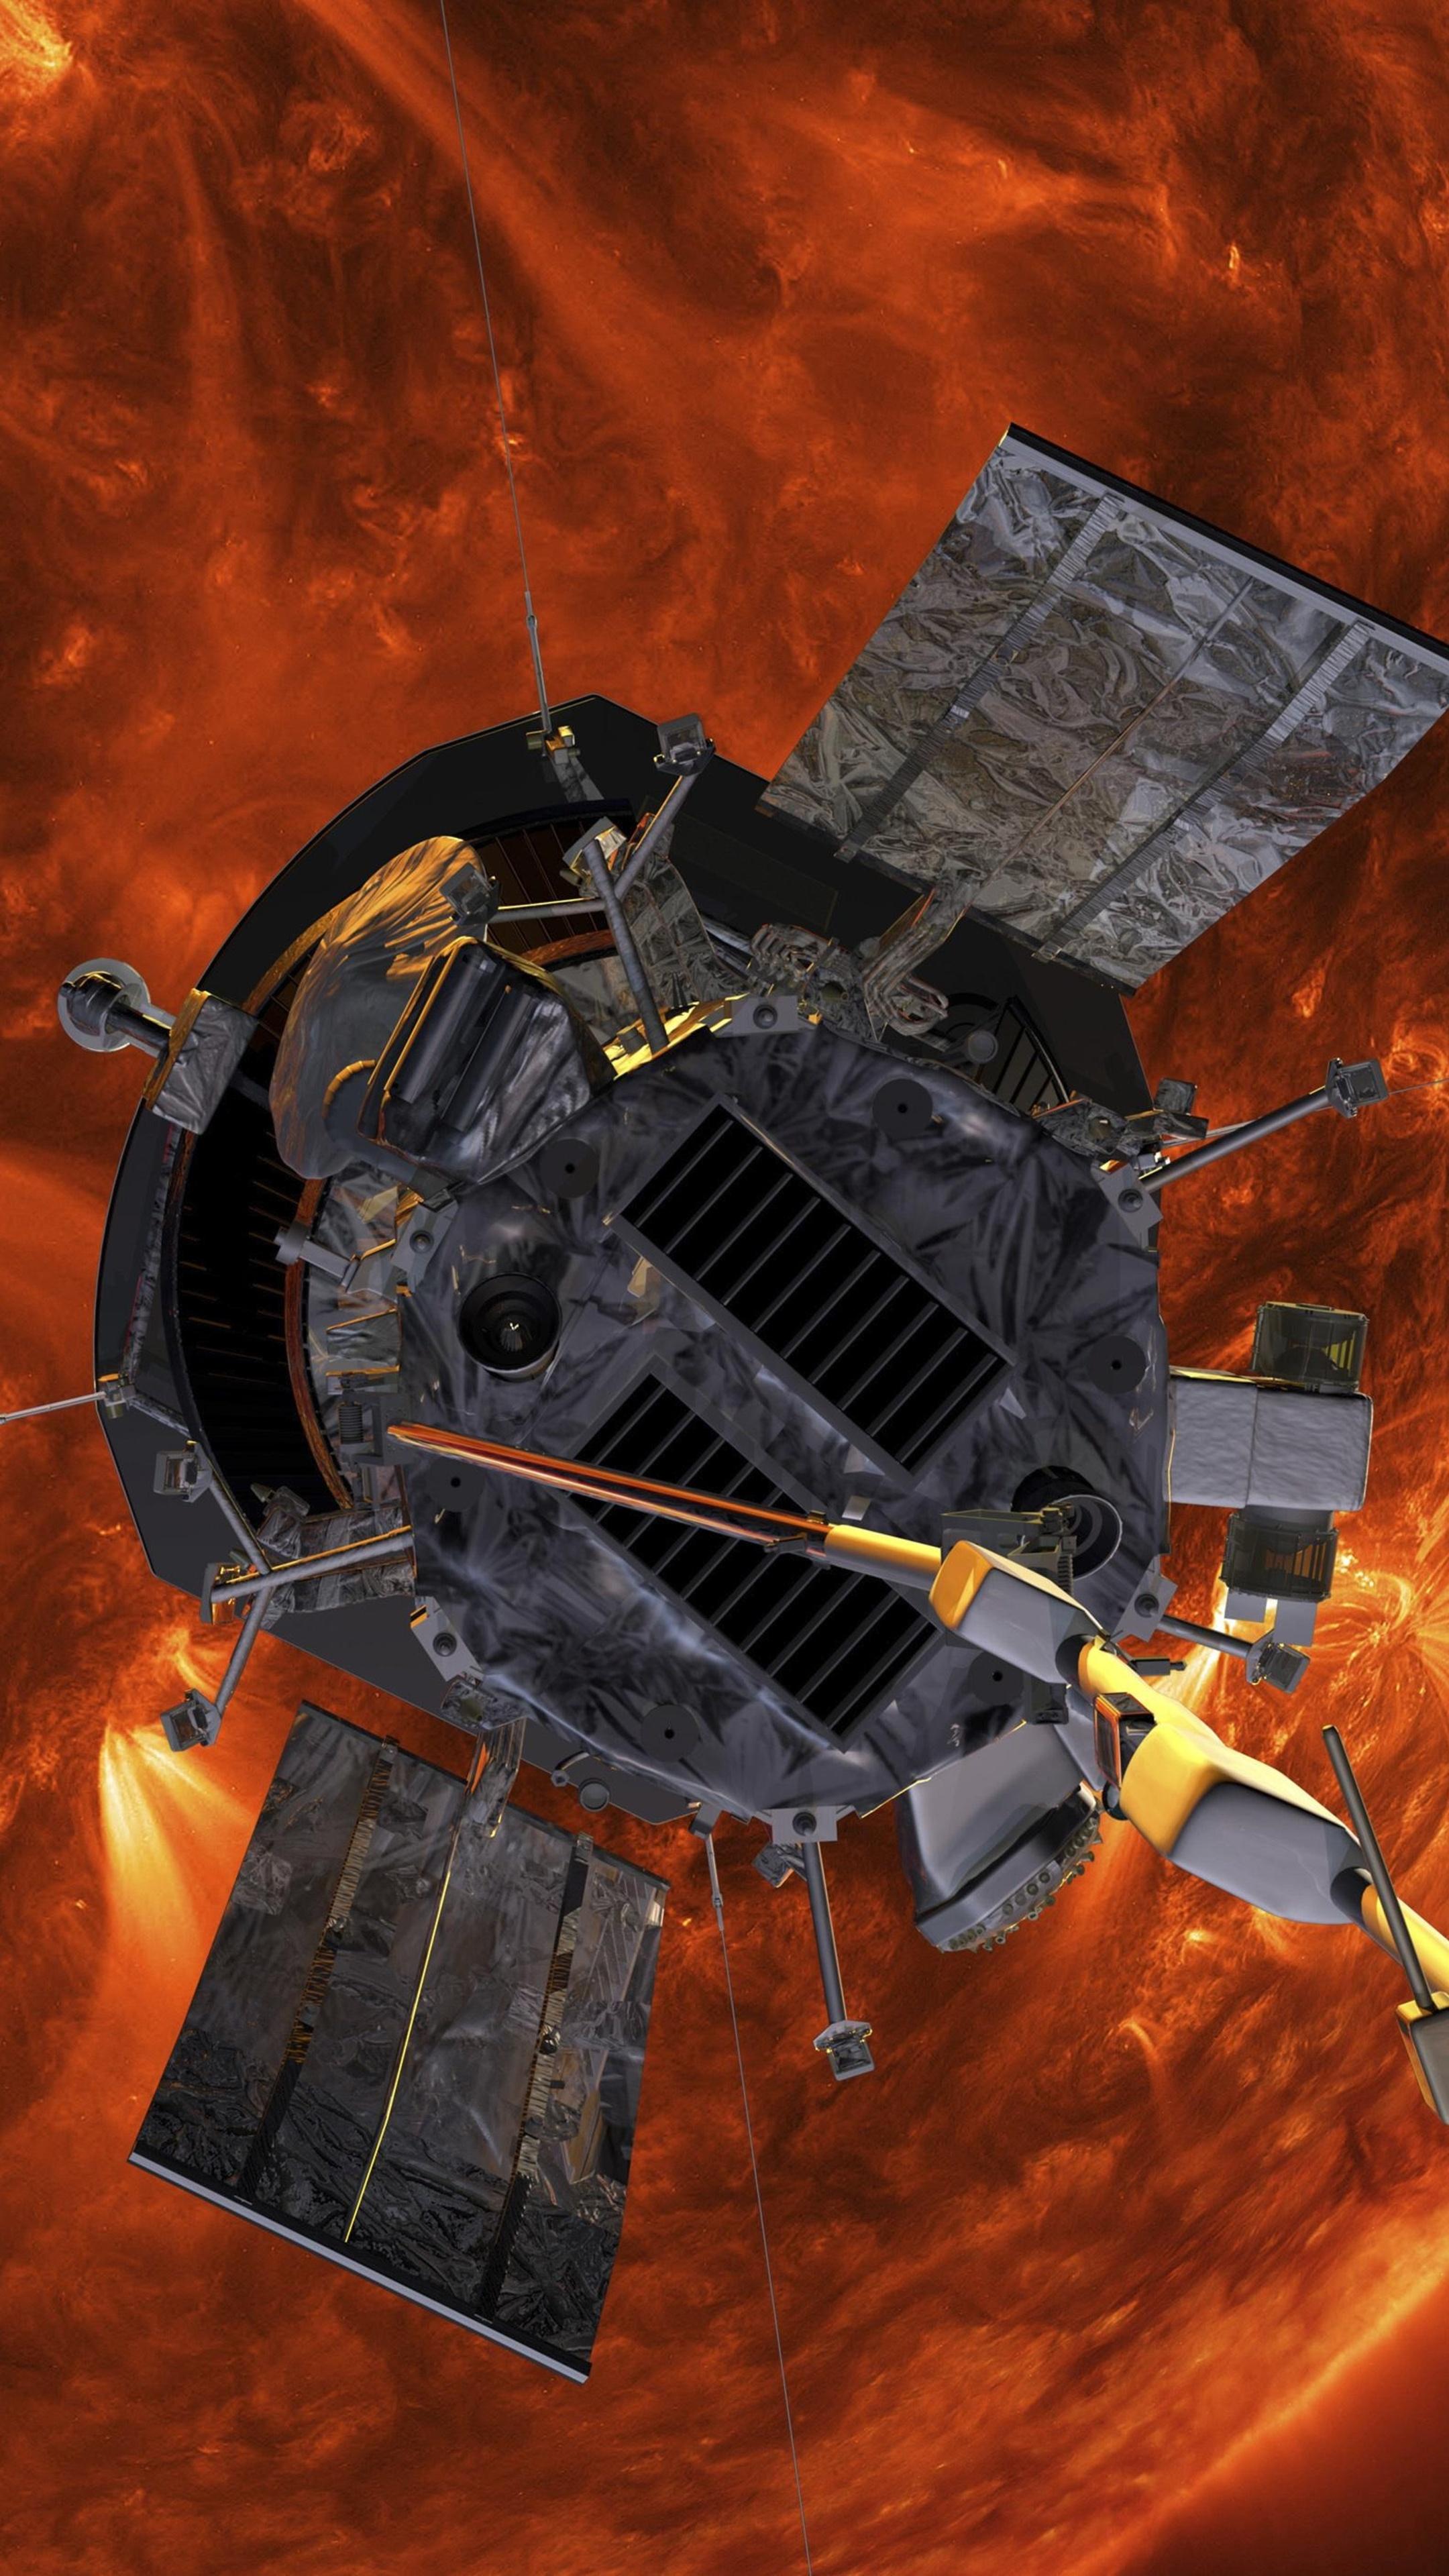 parker-solar-probe-7m.jpg